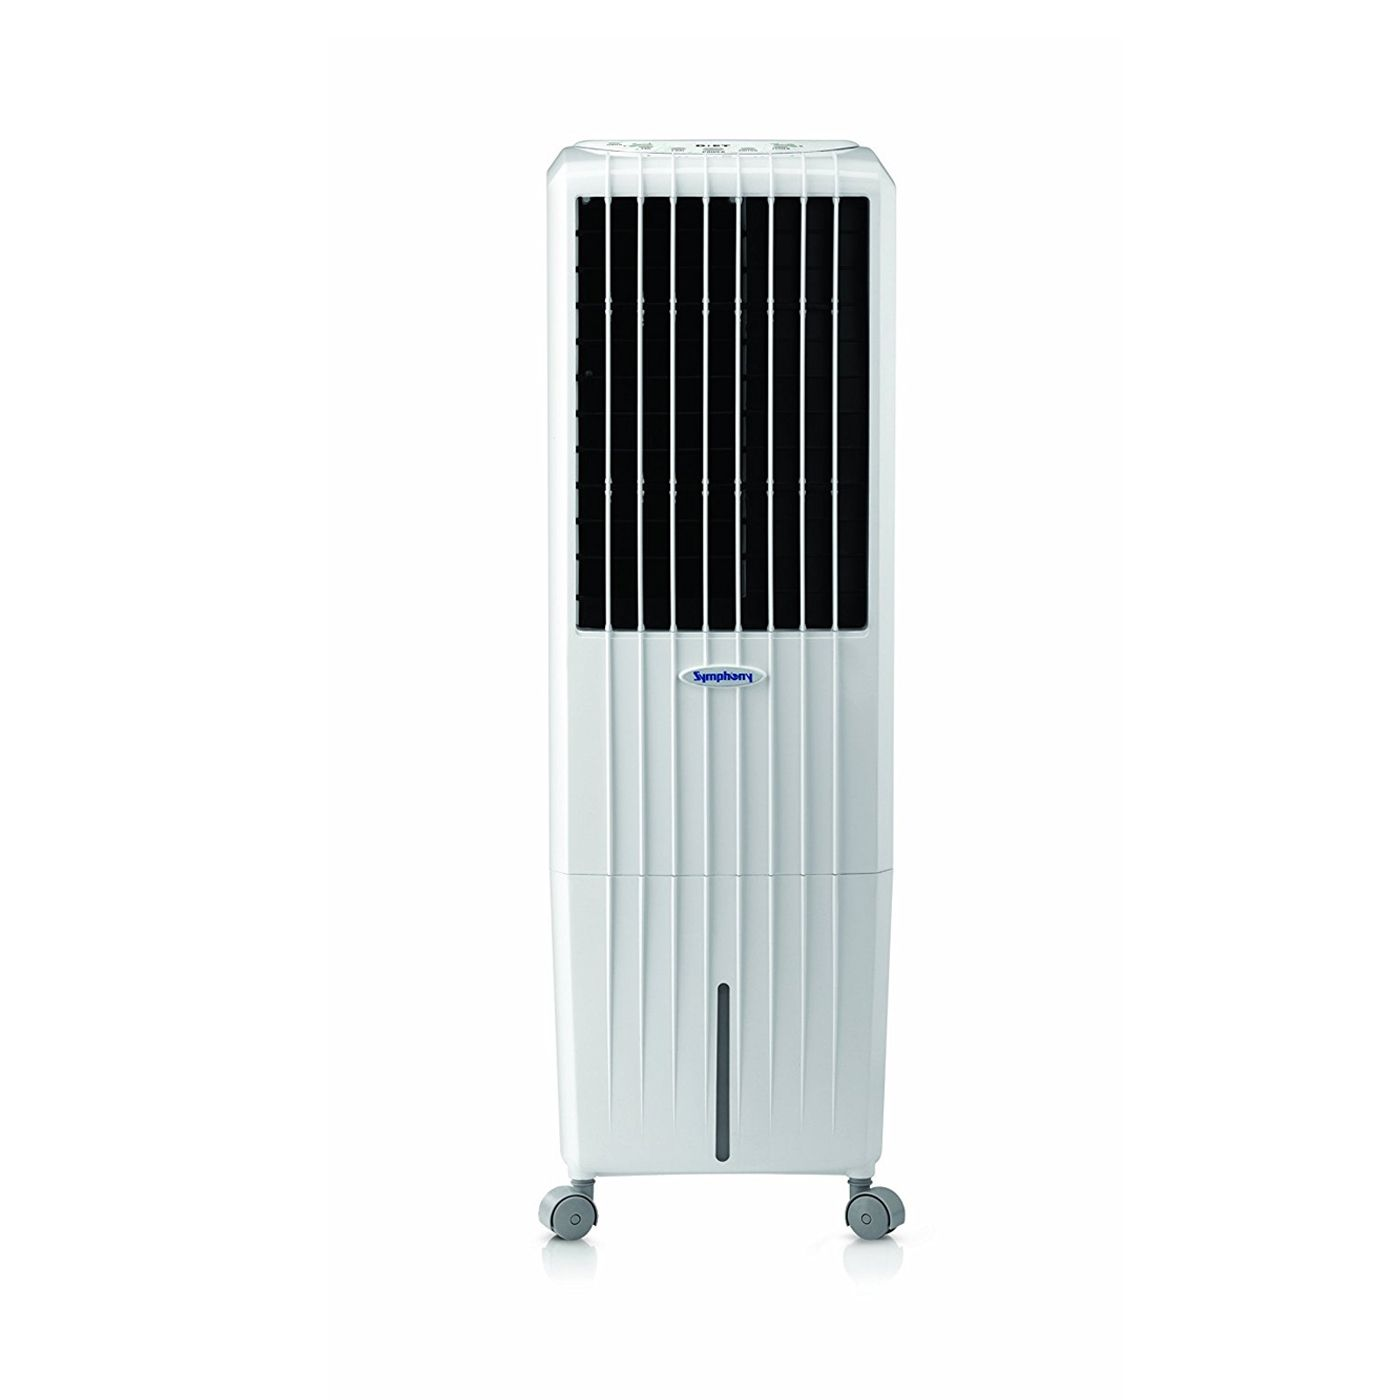 symphony diet remote control evaporative air cooler 8i. Black Bedroom Furniture Sets. Home Design Ideas